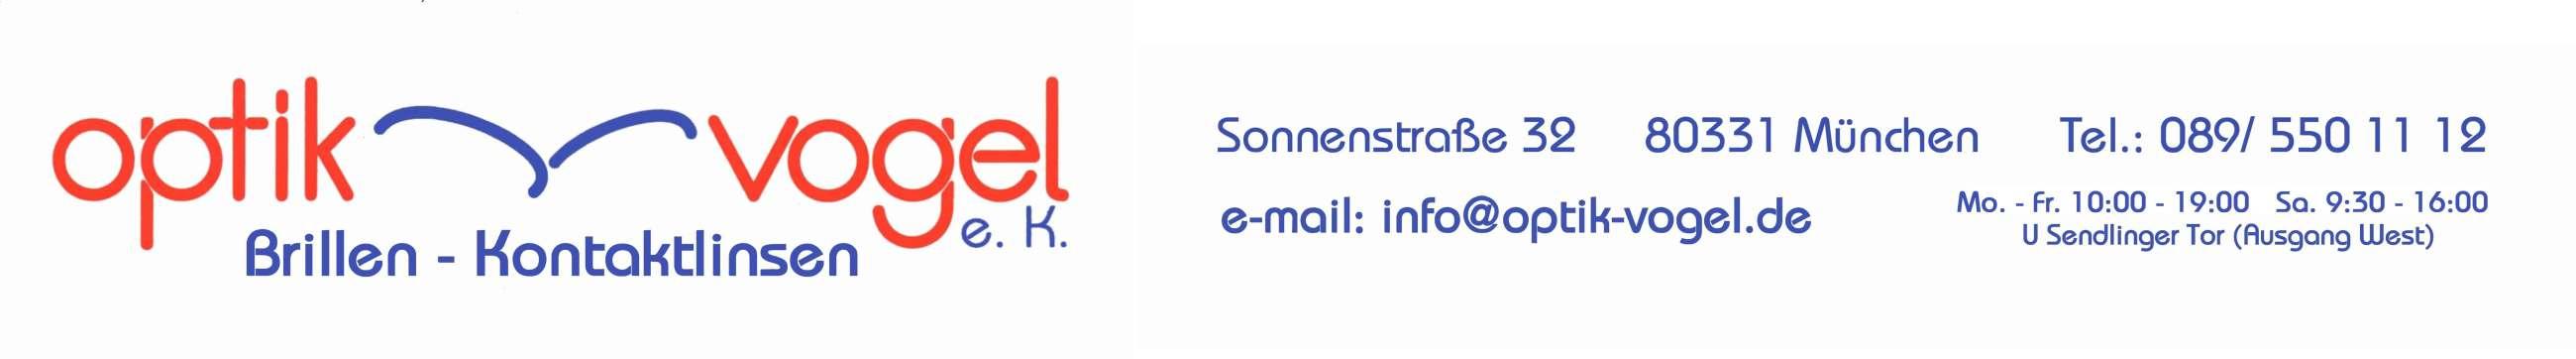 Optik Vogel e.K. - Sonnenstraße 32 - 80331 München - Tel. 089-5501112 - info@optik-vogel.de